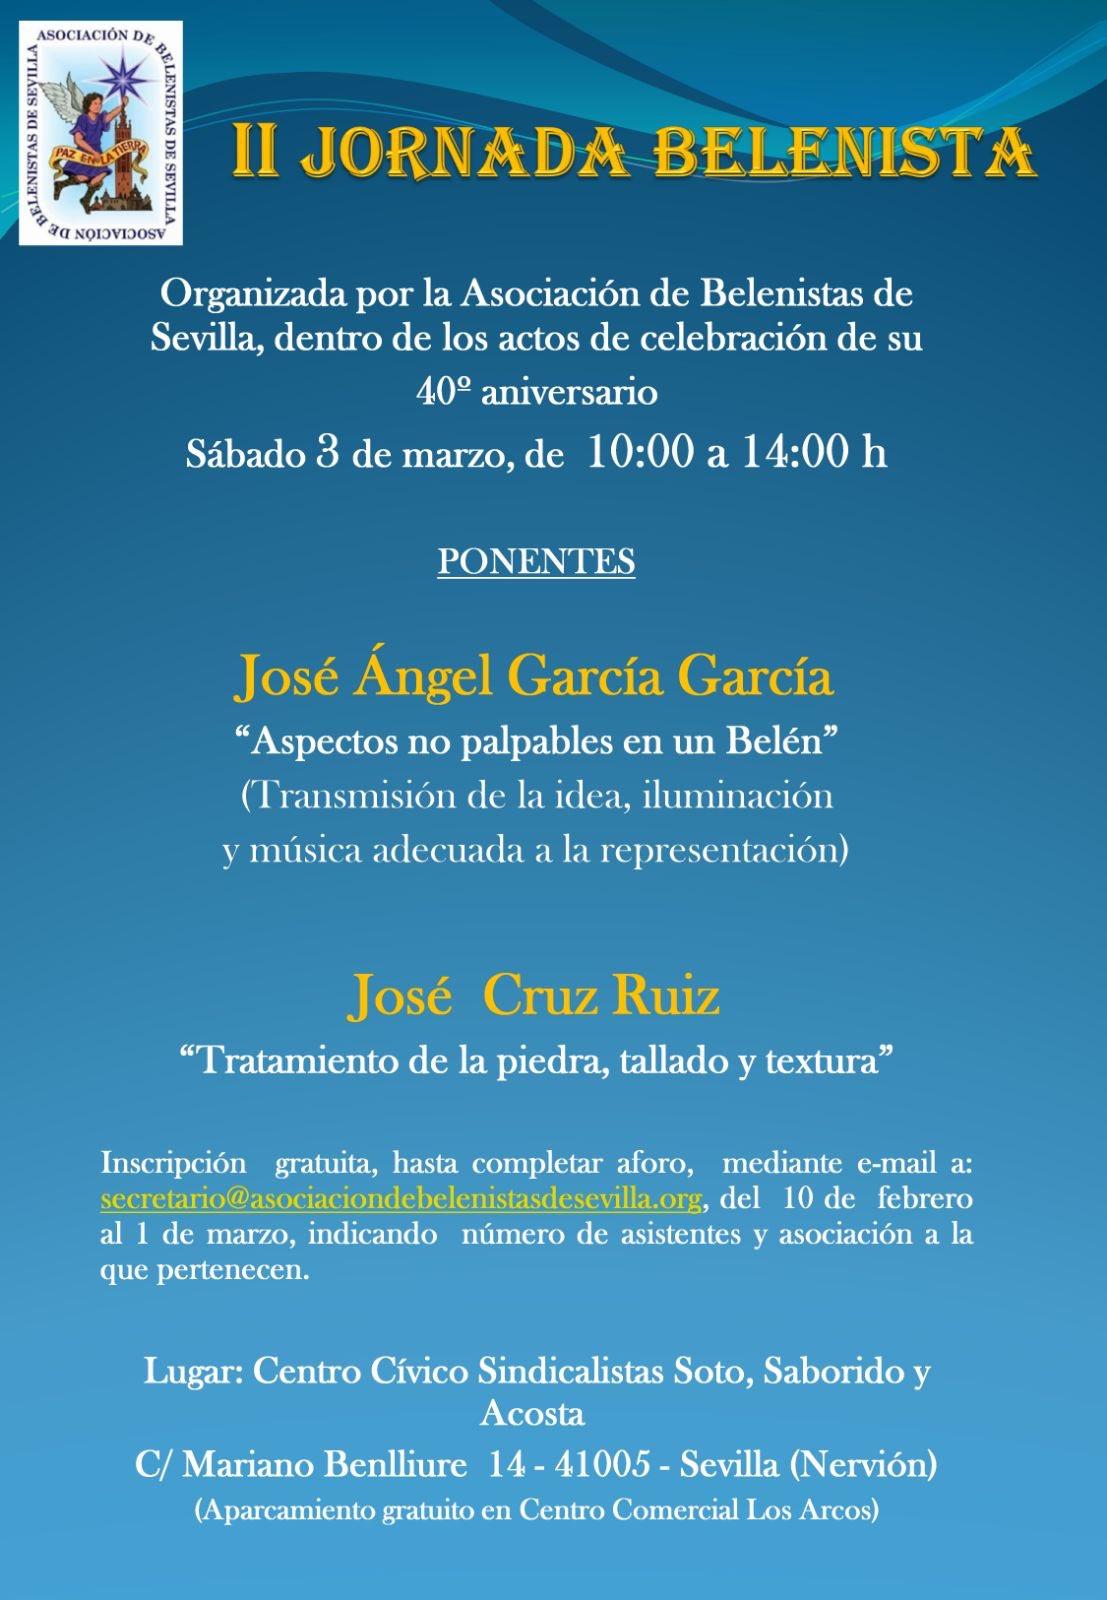 Cartel II Jornada Belenista - Asociación de Belenistas de Sevilla